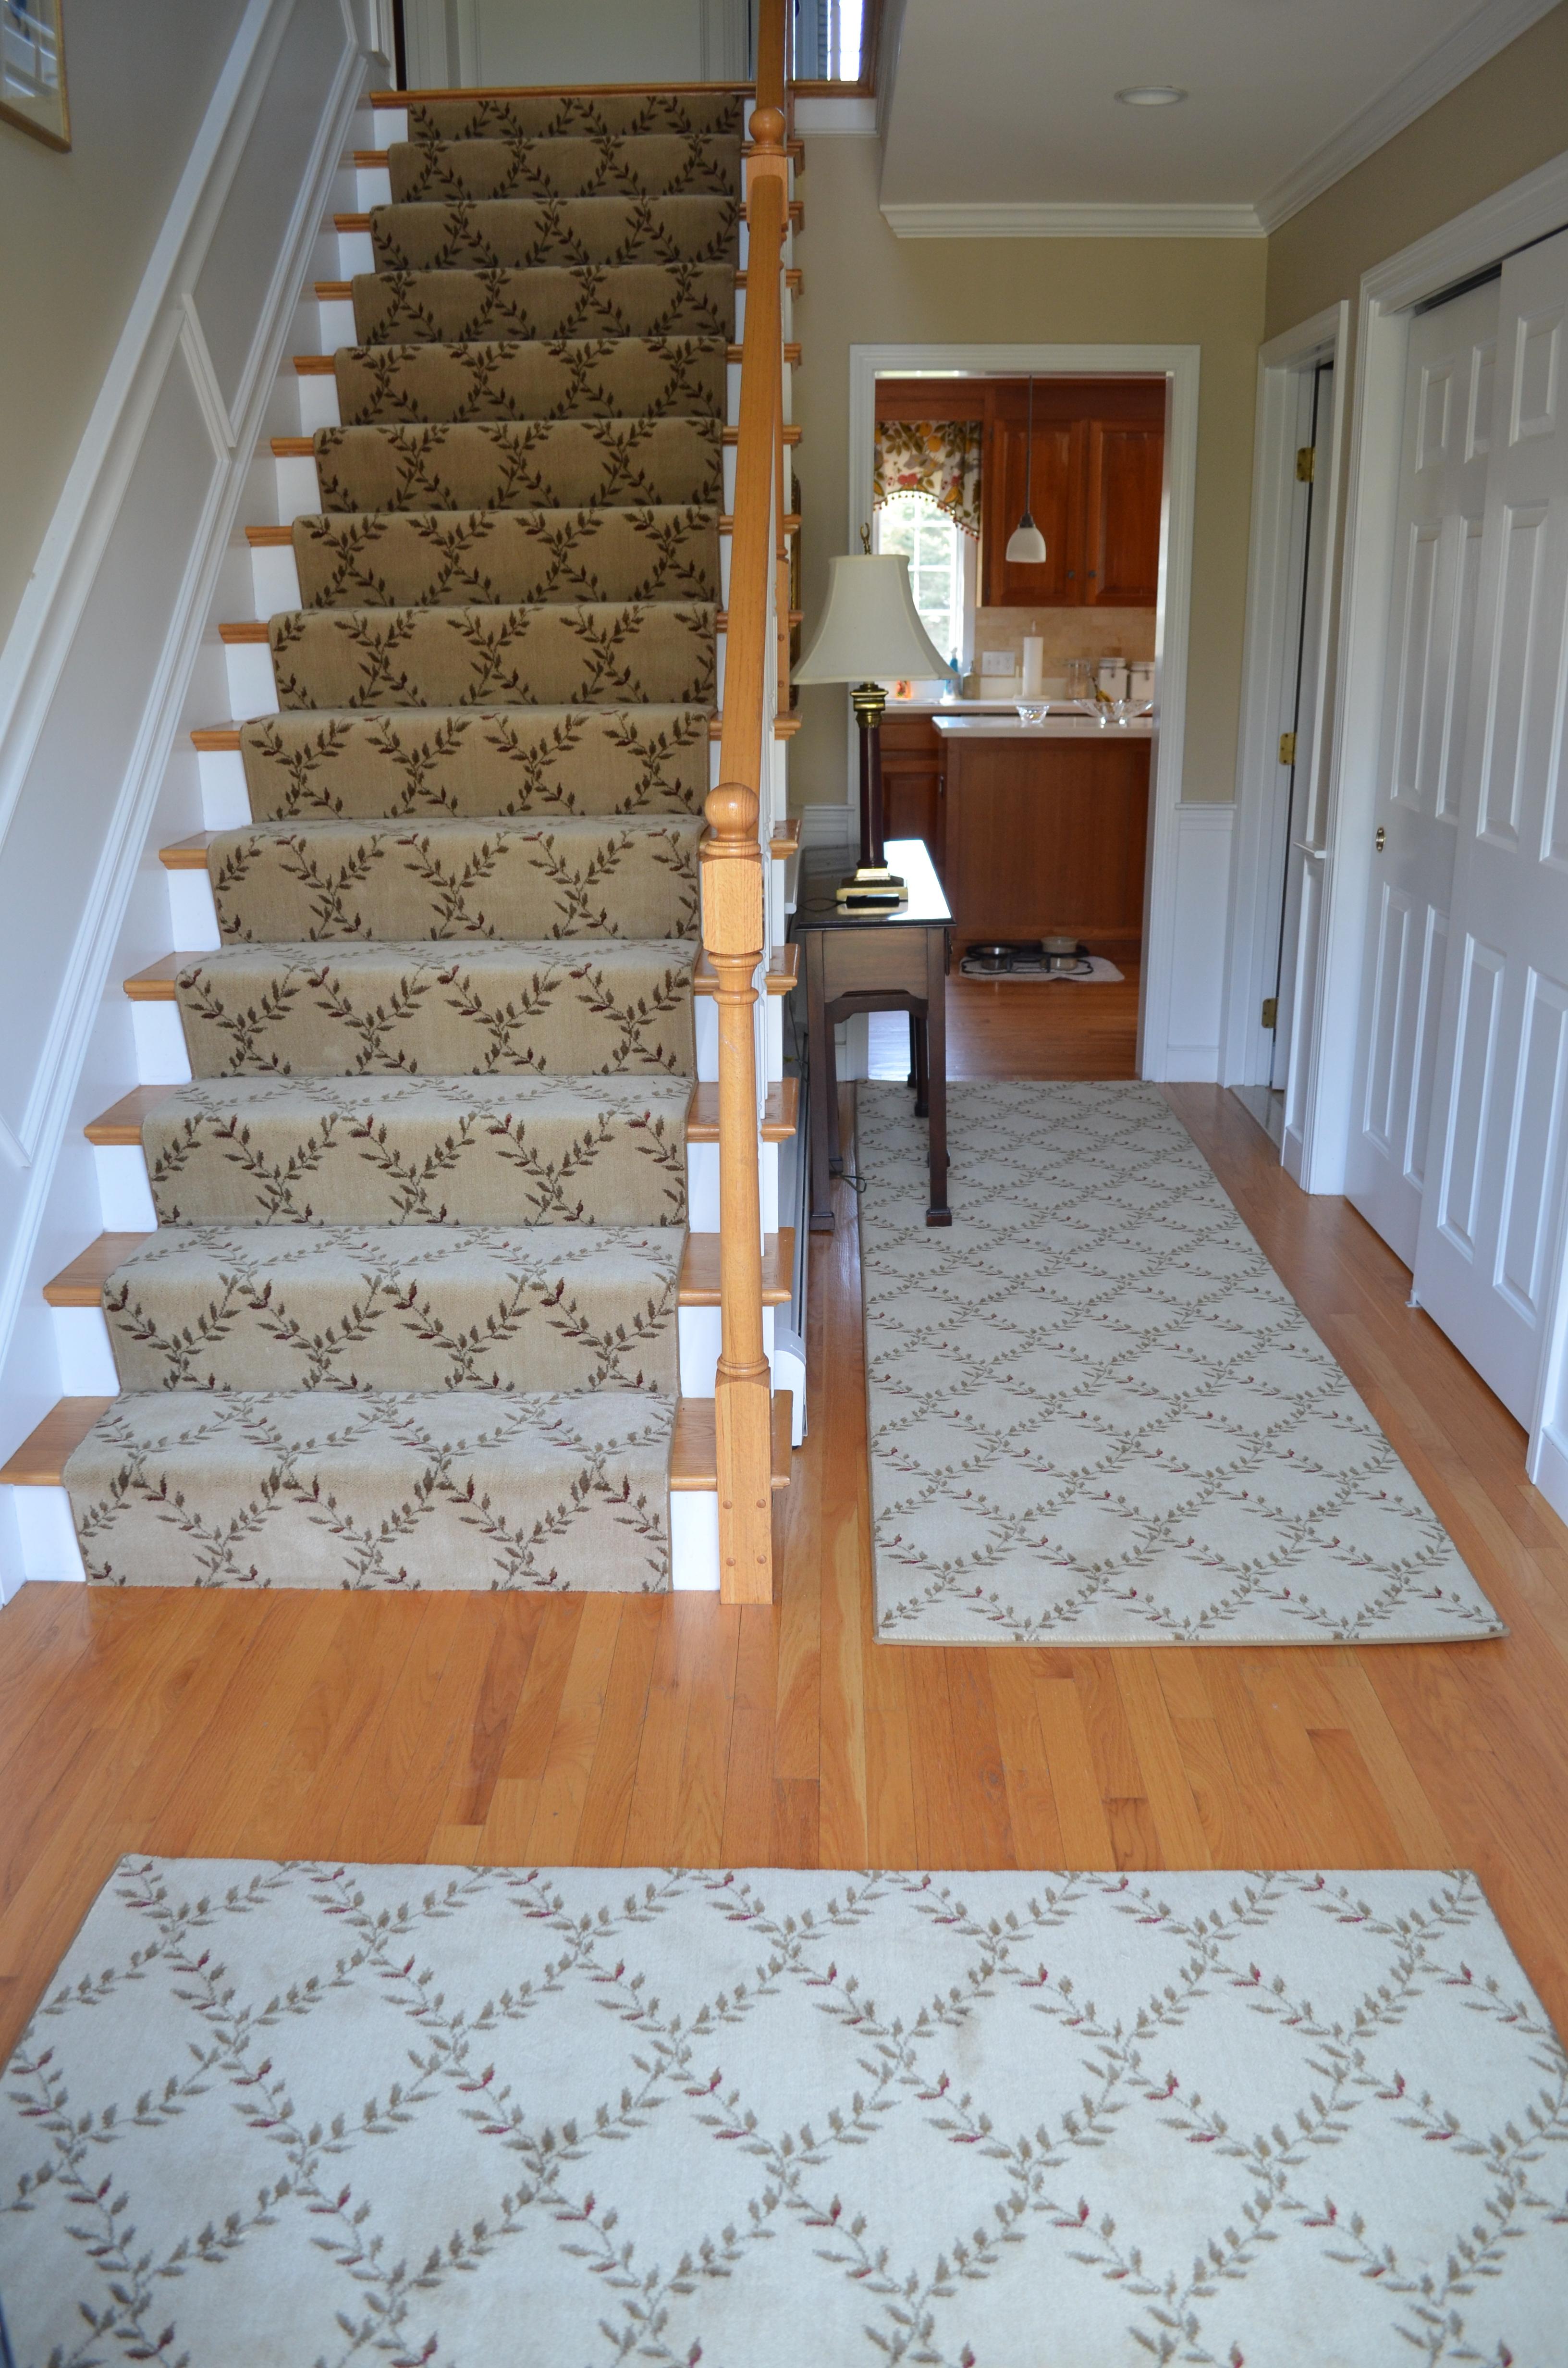 Flooring Hallway Runners Carpet Runers Rugs With Runner For 10